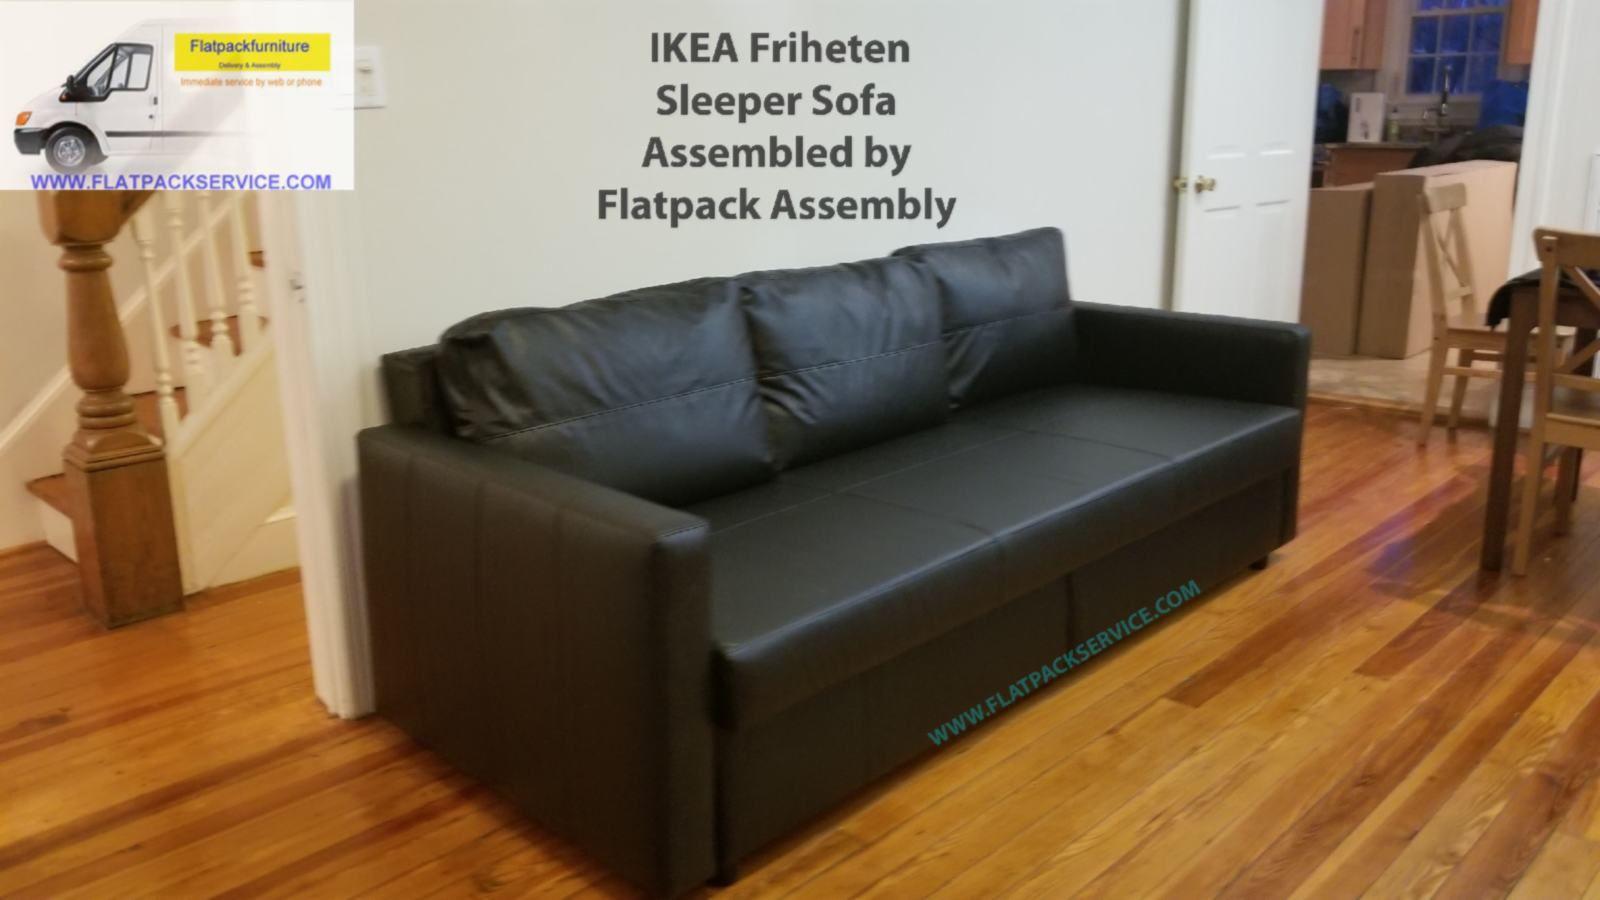 Ikea Friheten Sleeper Sofa Bed Assembly In Washington Dc Md Va 202 277 5911 Furniture Assembly Ikea Furniture Assembly Ikea Ektorp Sofa